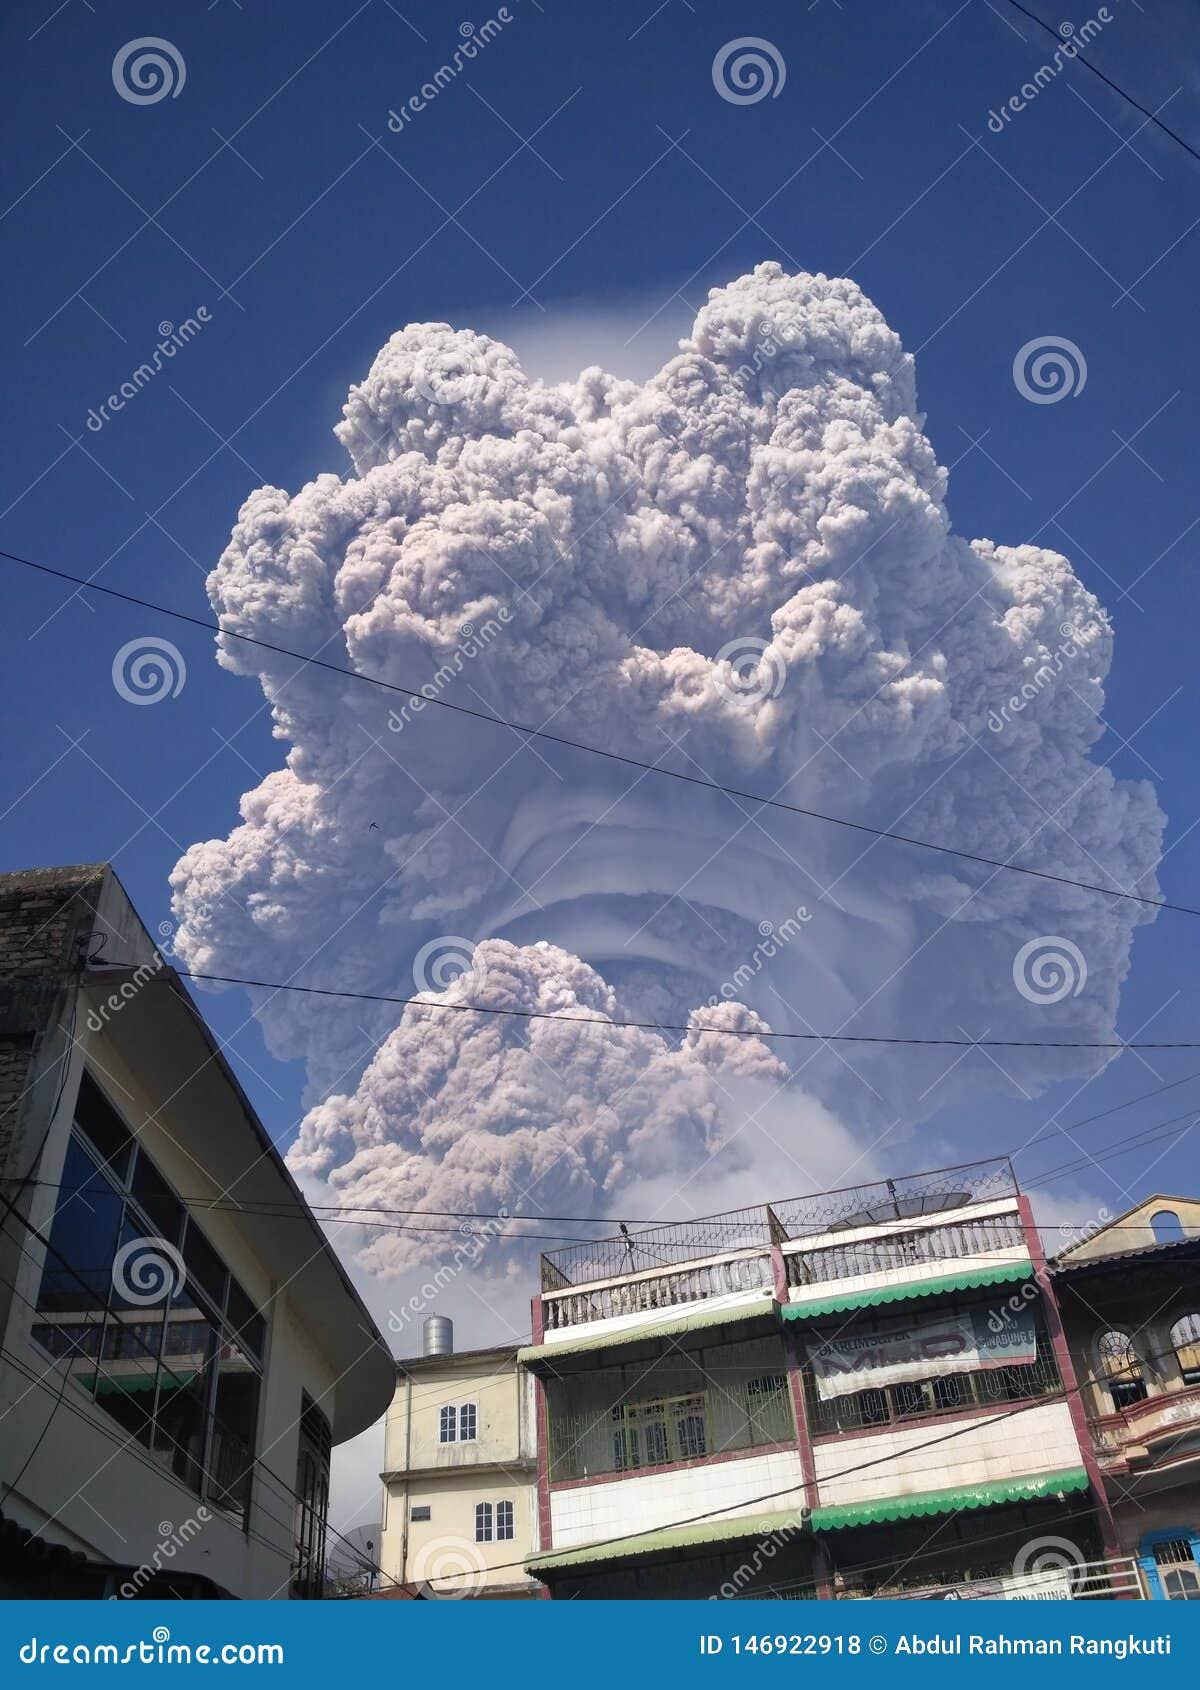 Eruption of Sinabung Mount